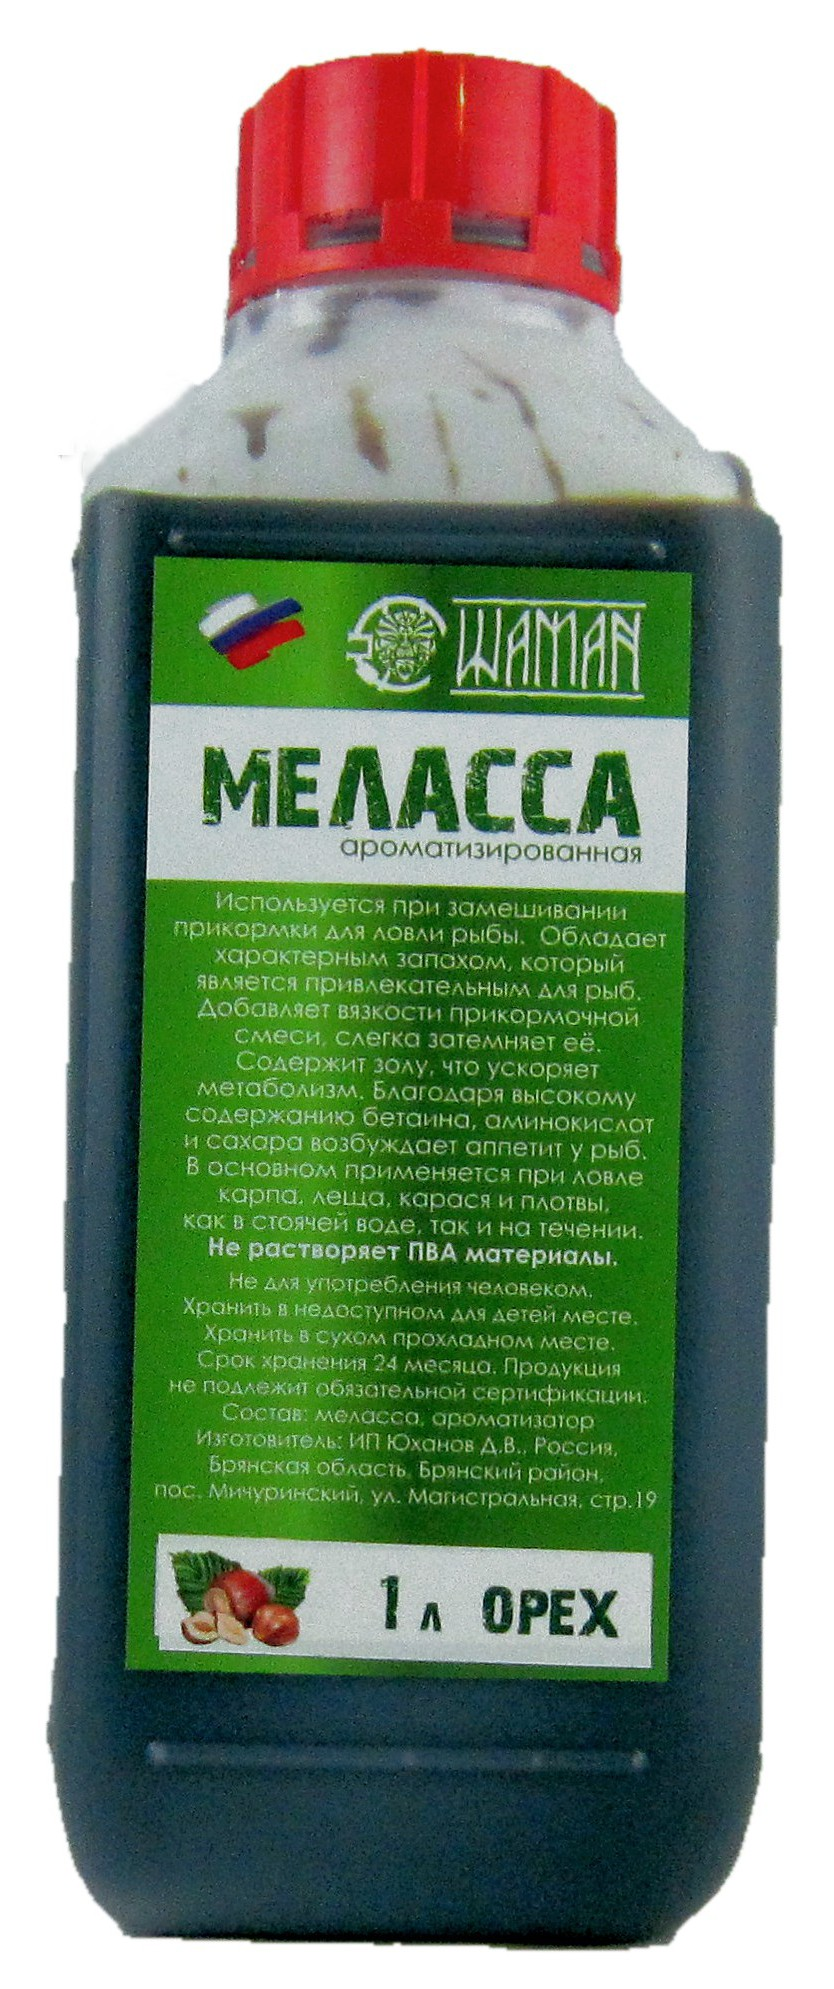 Меласса с ароматом ореха ШАМАН